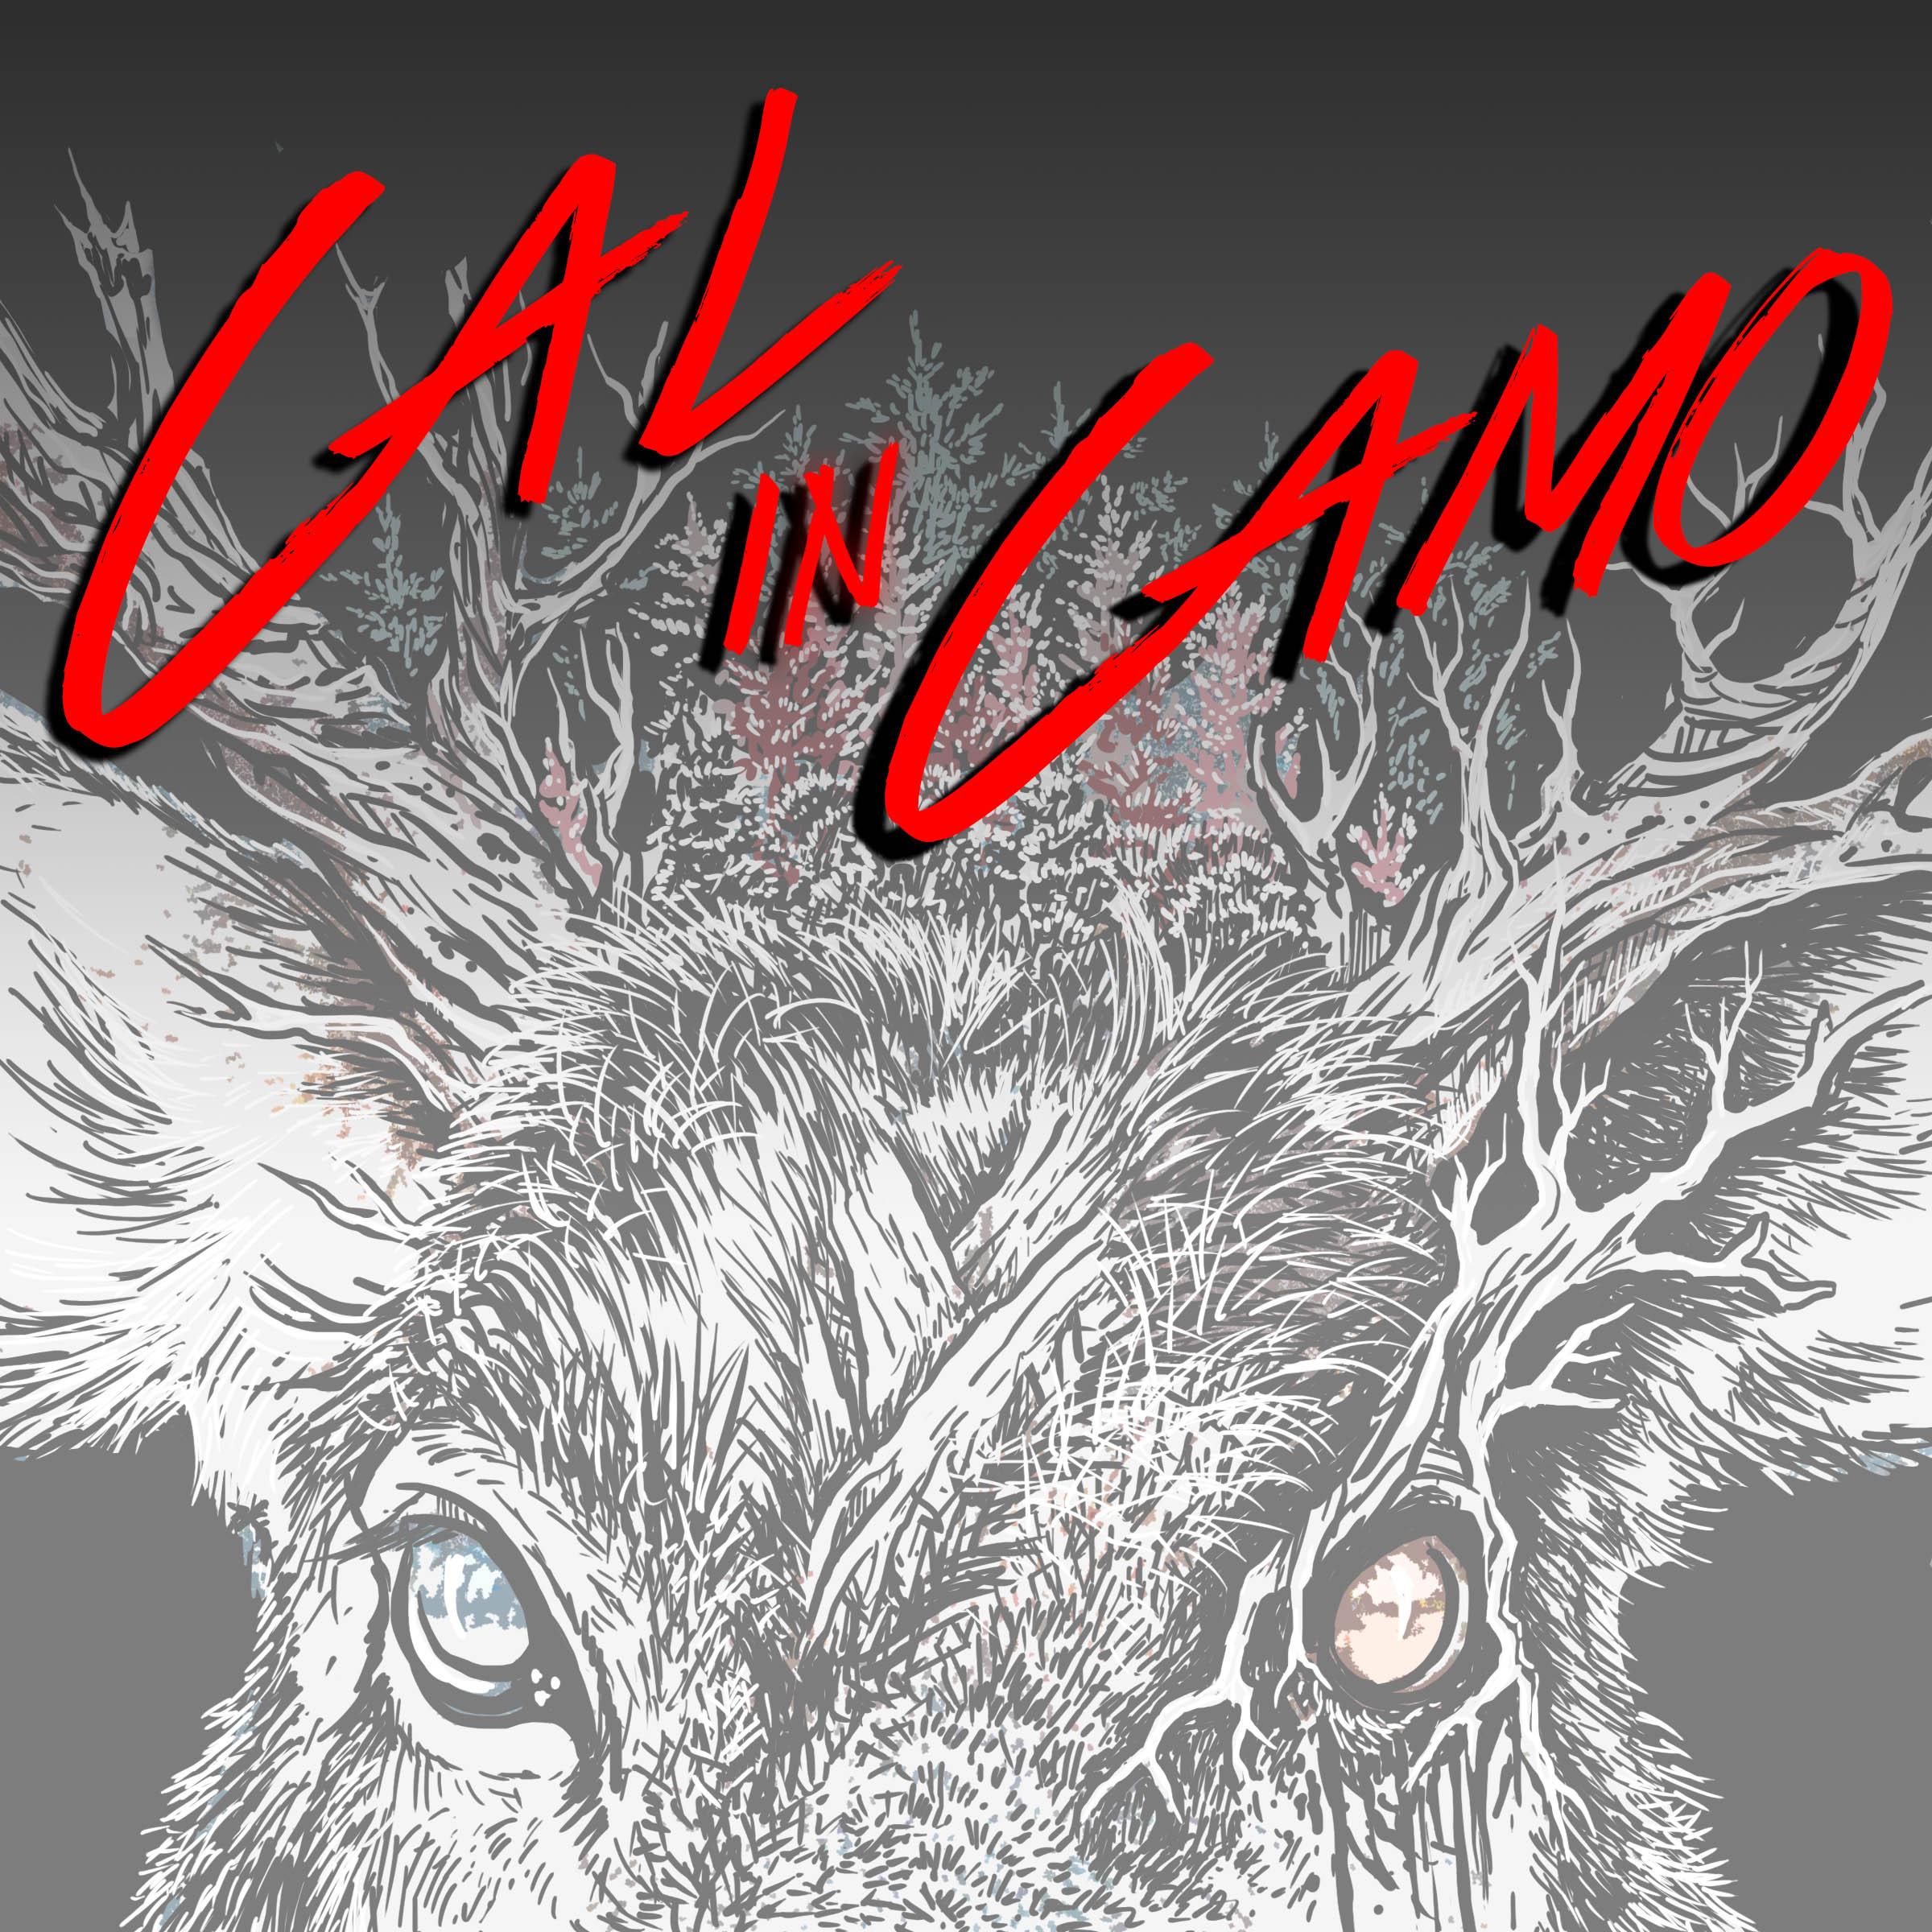 Red Dog Squadron Cal in Camo Calendar Sq